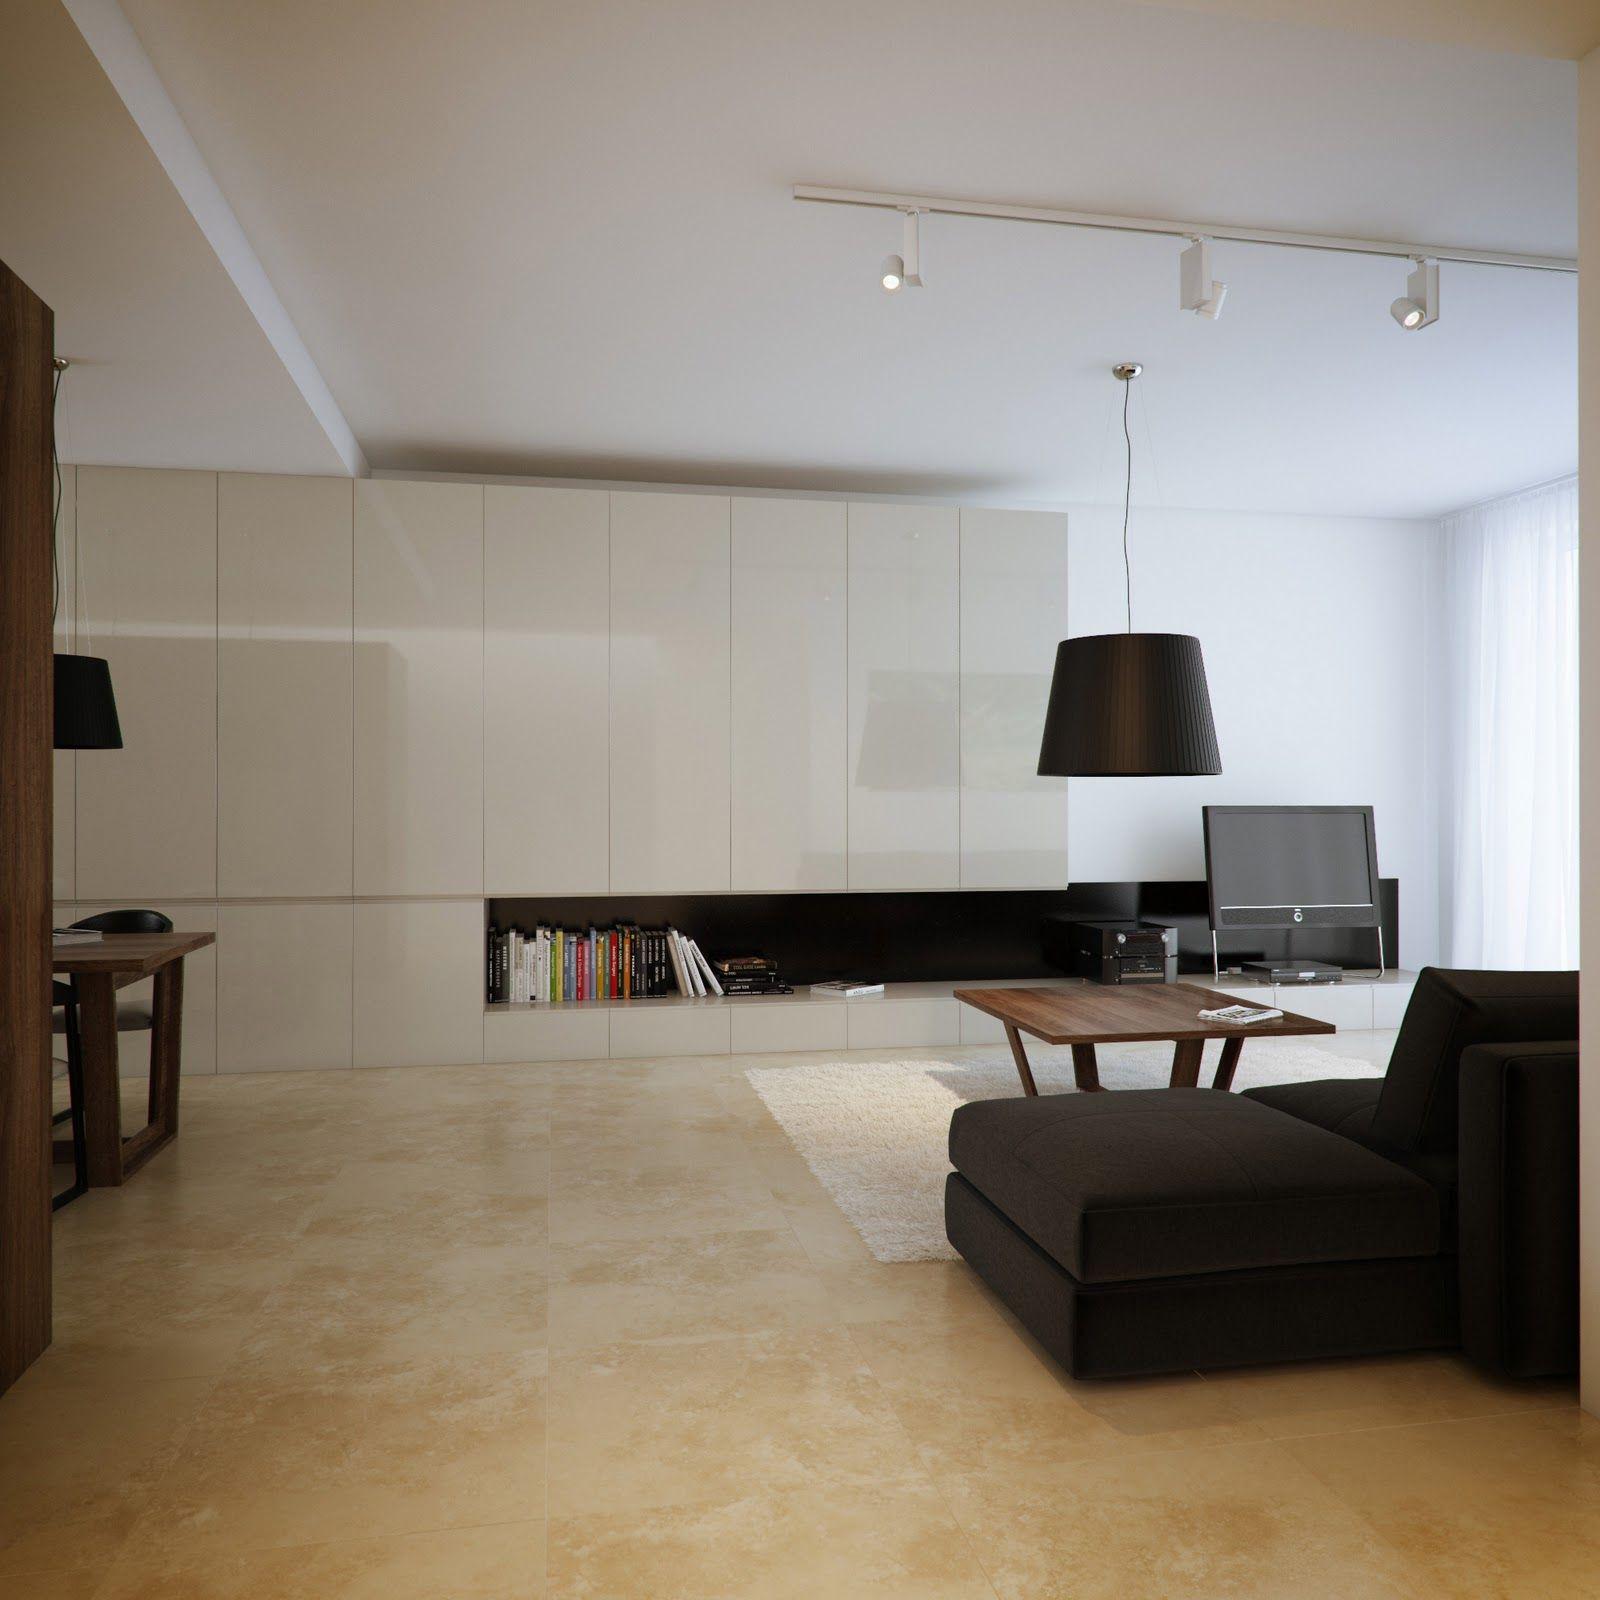 Modern Minimalist Black and White Lofts Floor decor